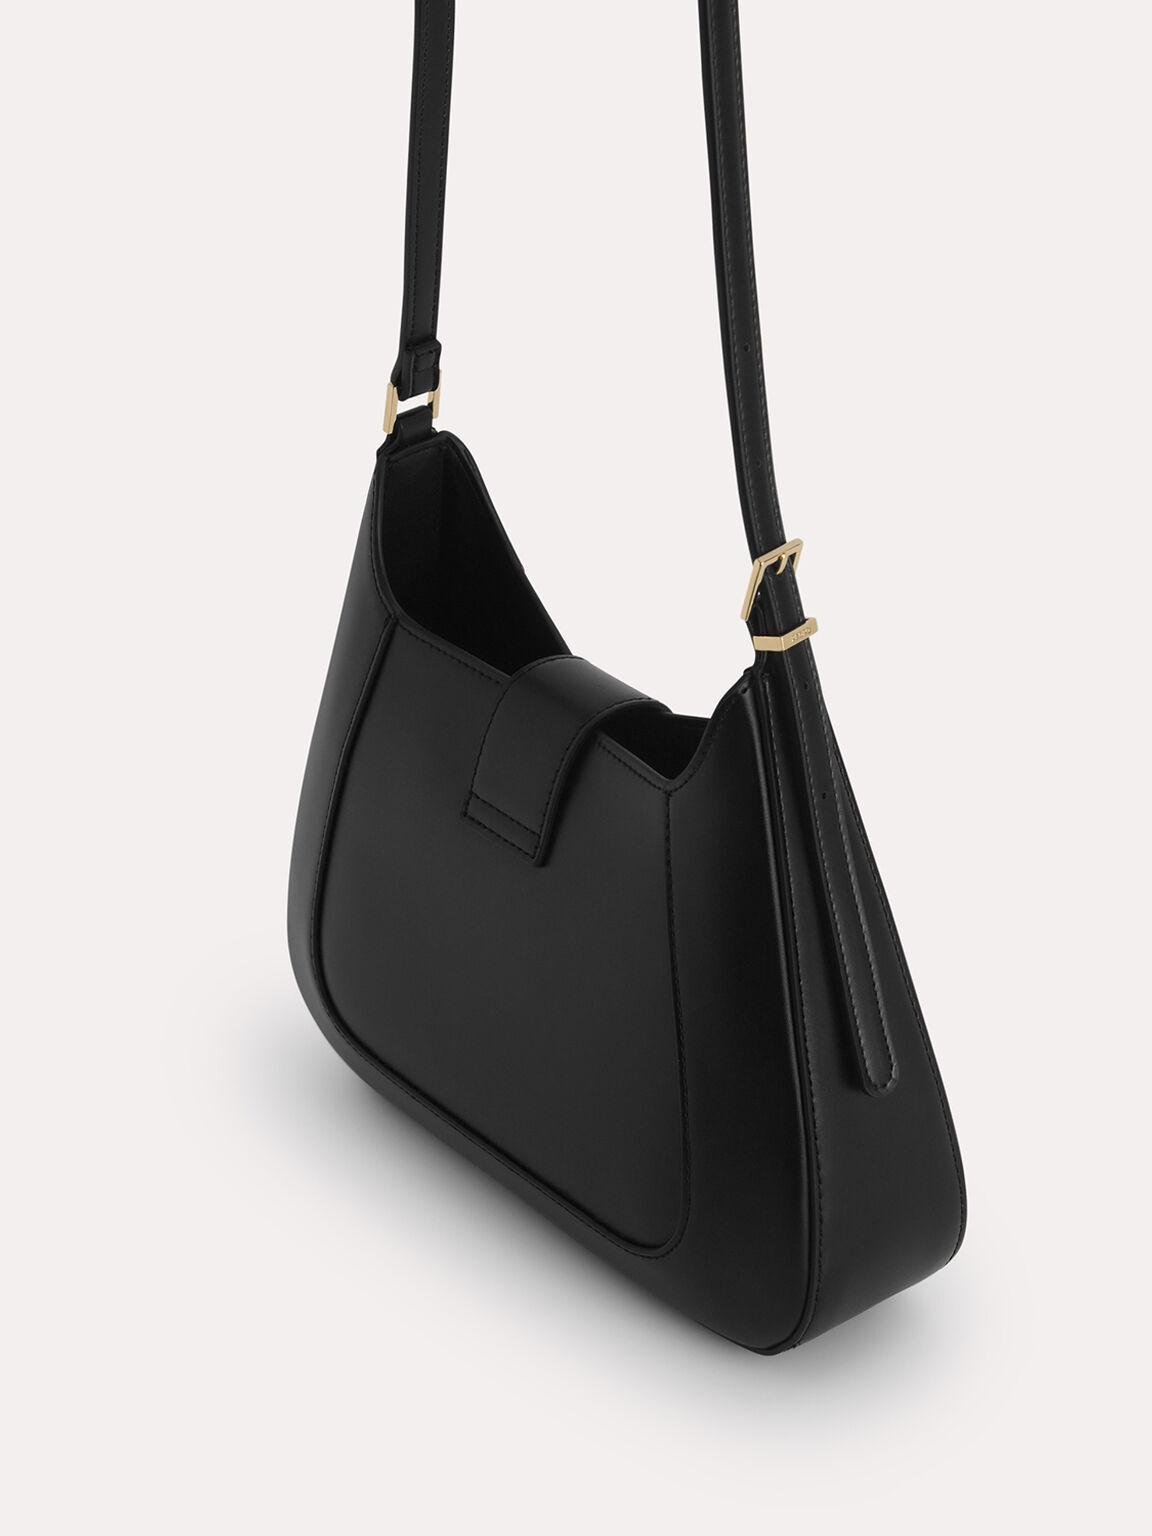 Top Handle Bag with Oval Buckle, Black, hi-res